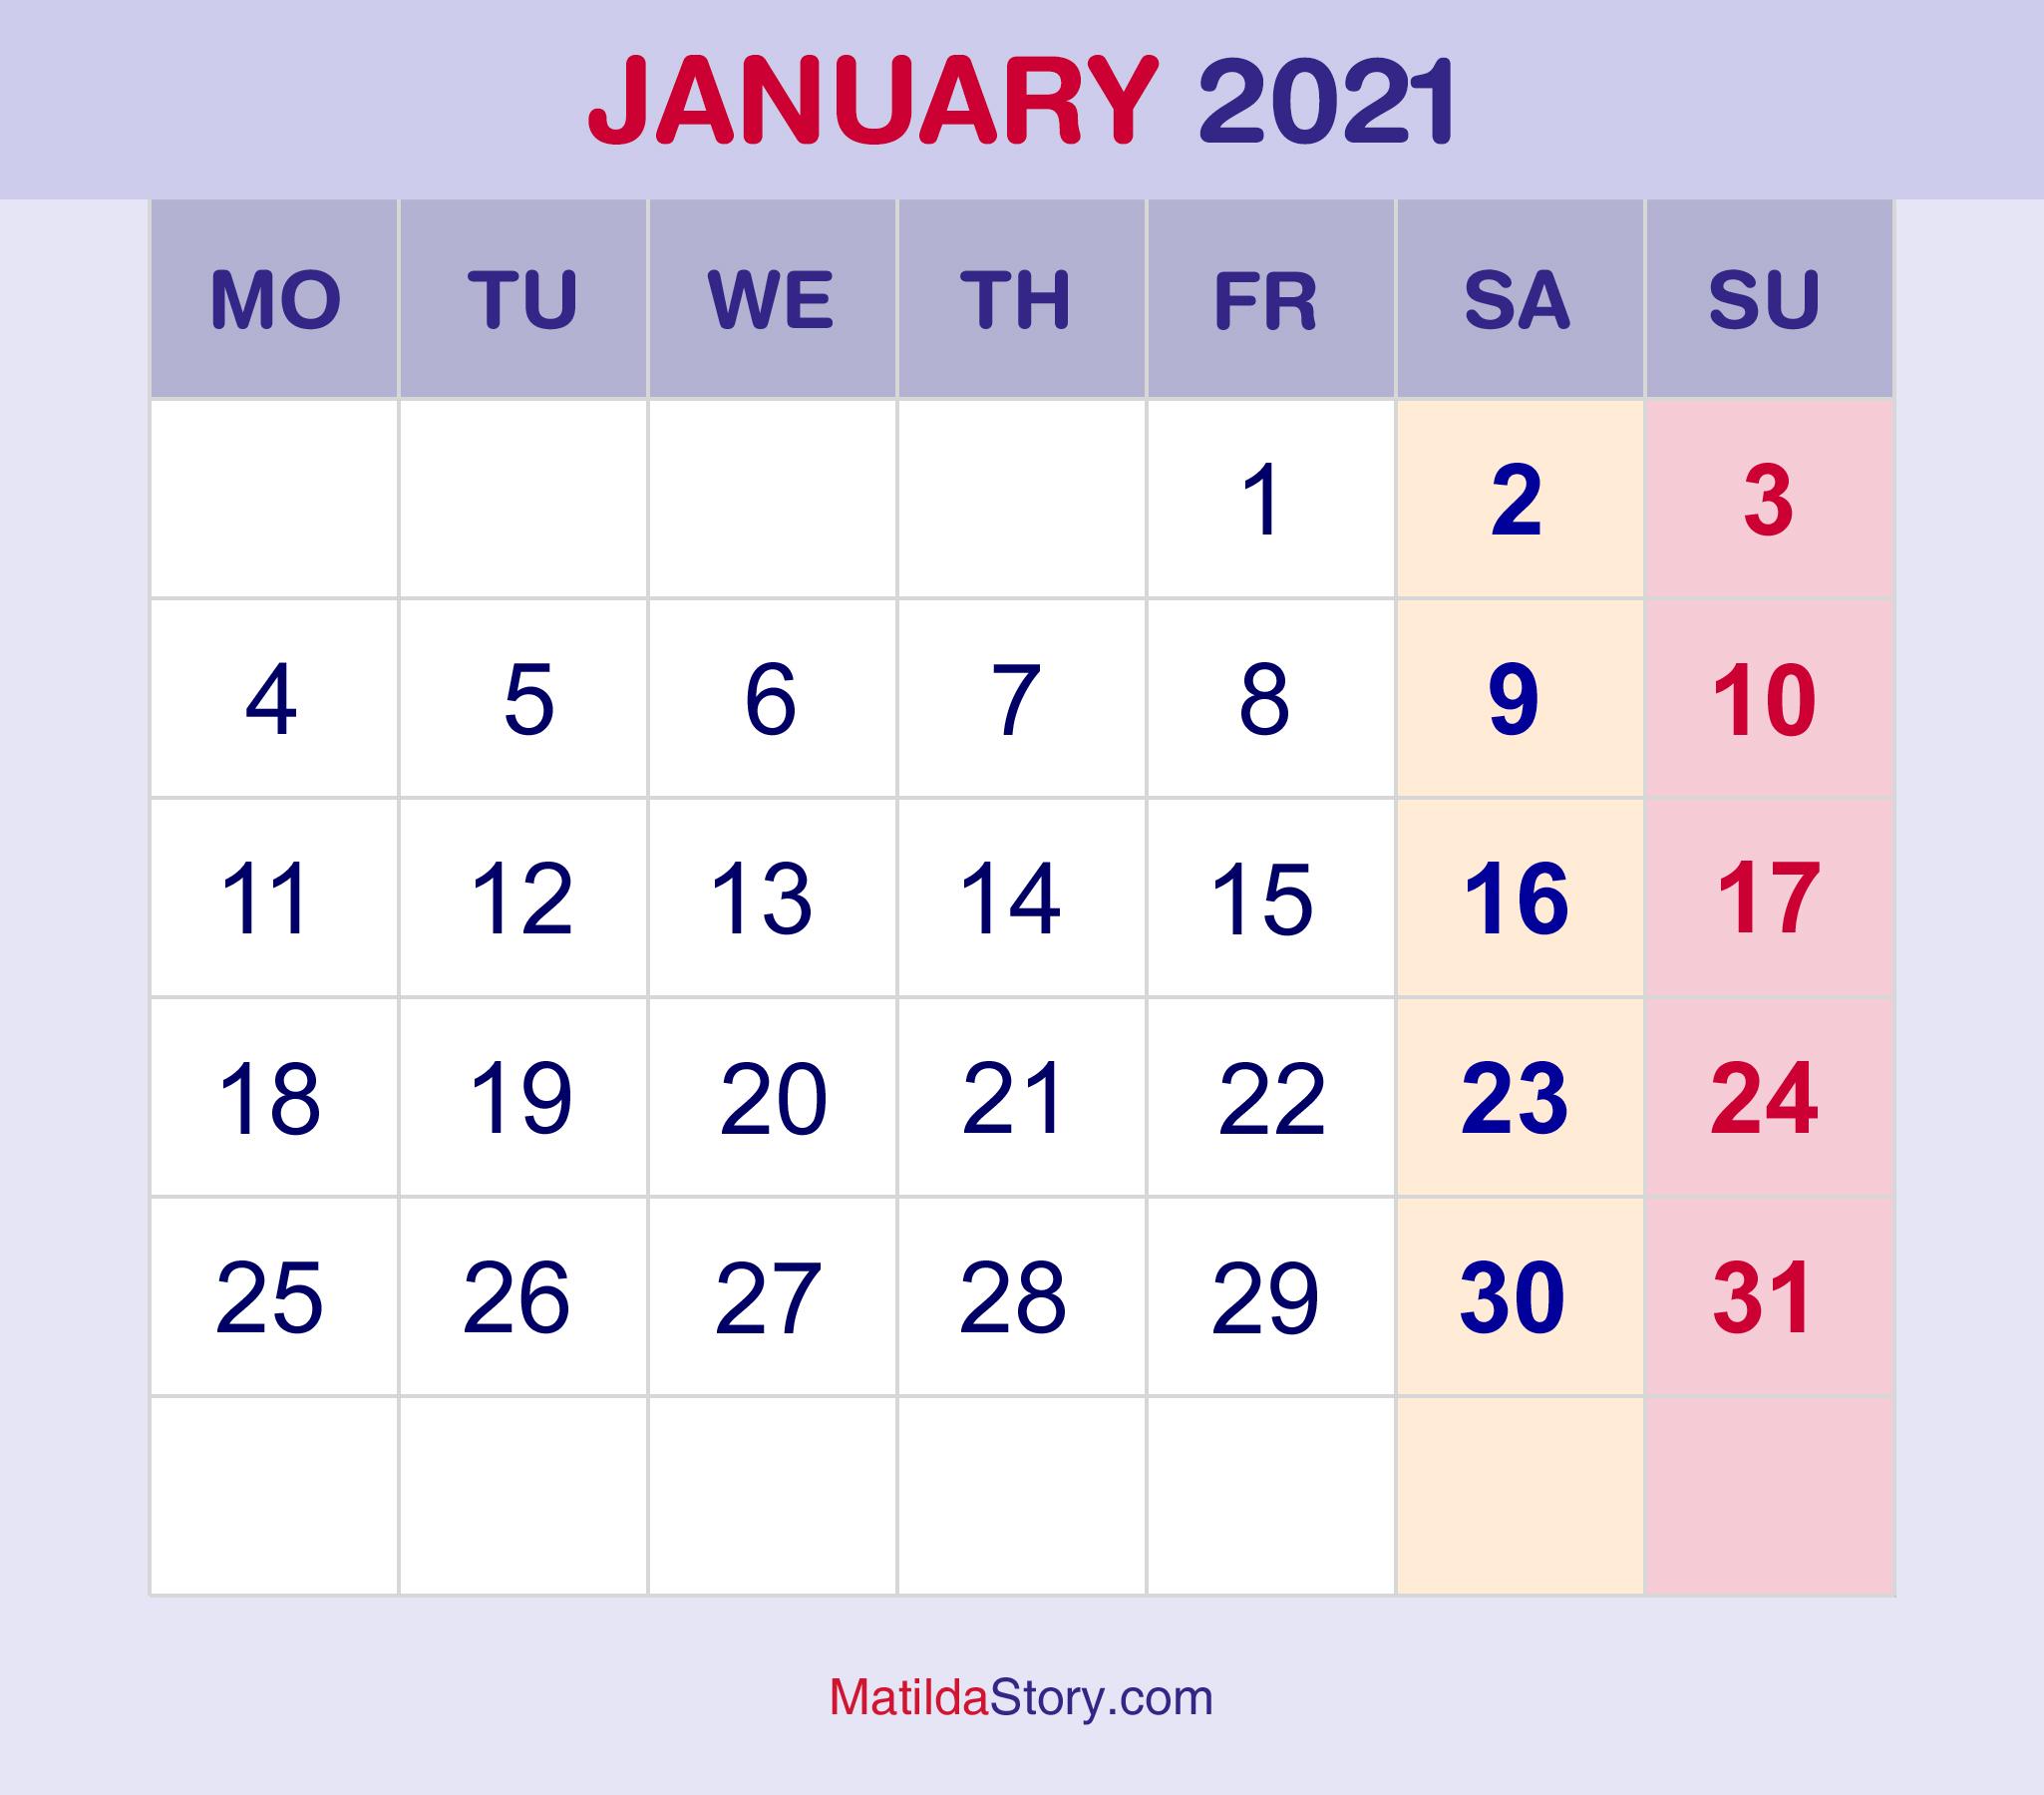 January 2021 Calendar Free Download : January 2021 Free